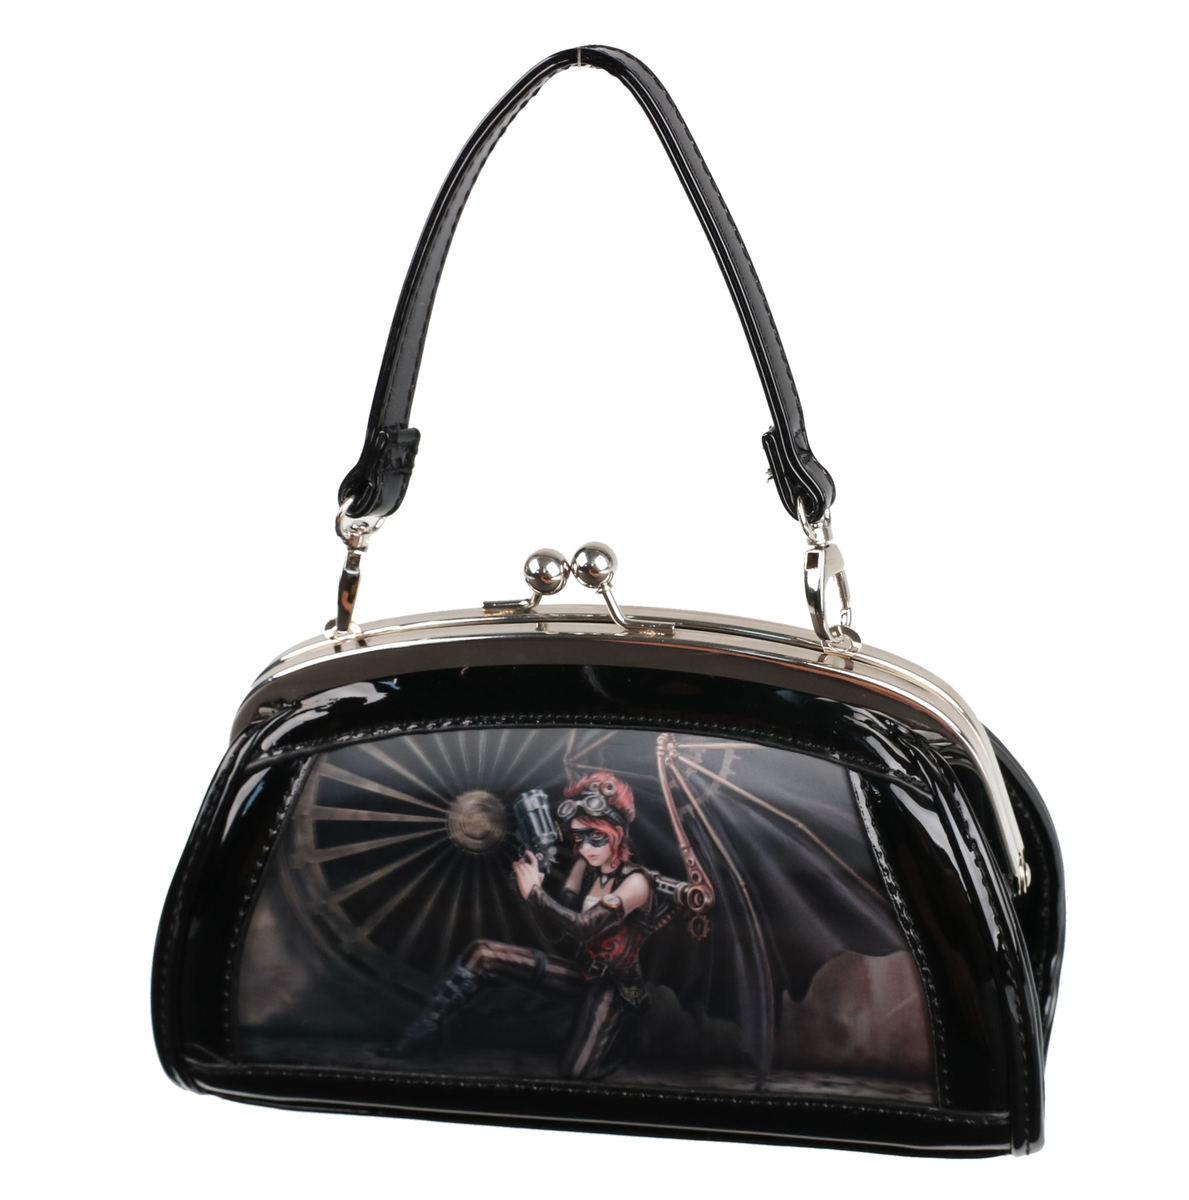 kabelka (taška) ANNE STOKES - Assassin - Black - AS011